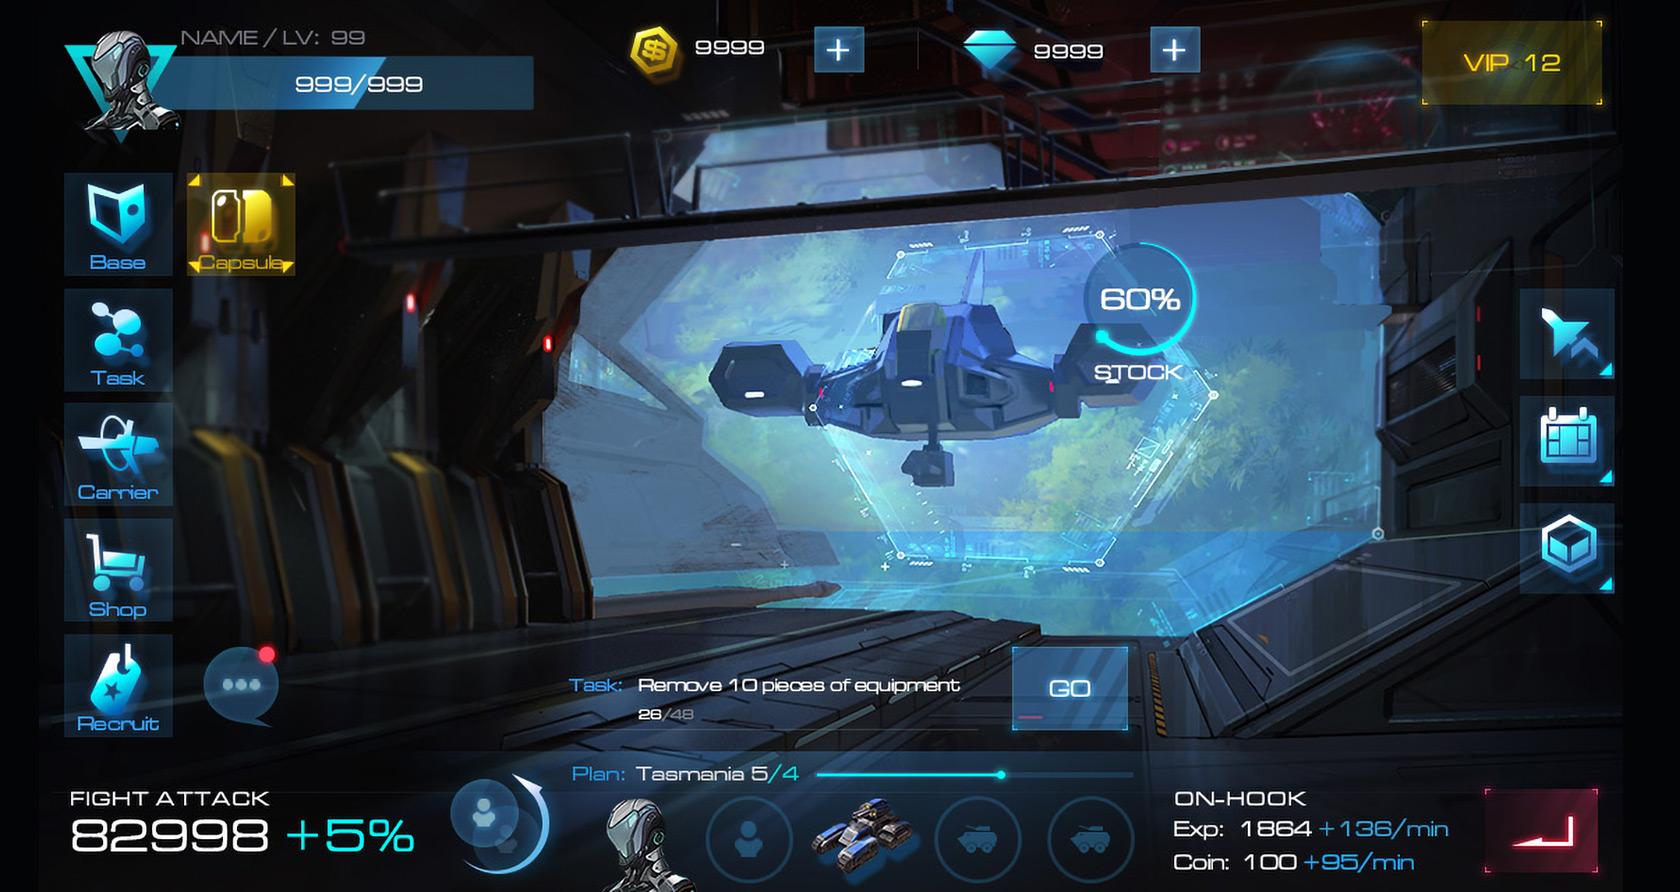 Game UI (2020)